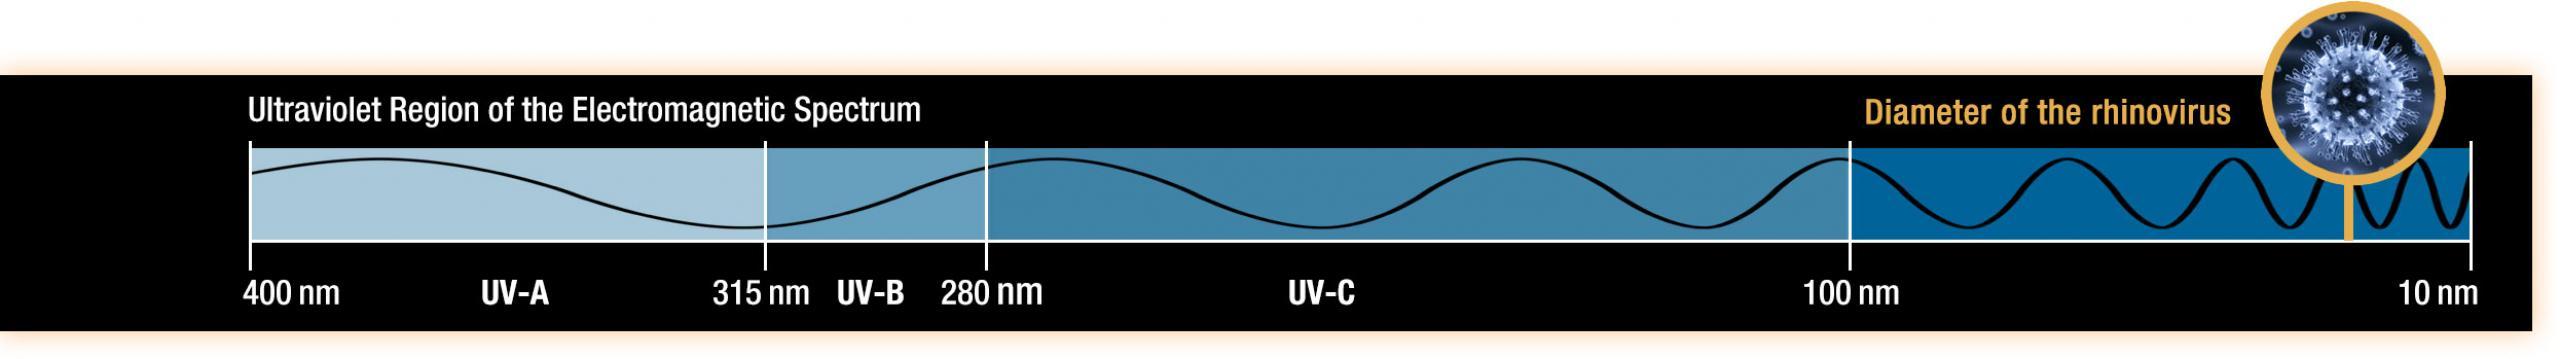 Illustration of an ultraviolet wave on the electromagnetic spectrum